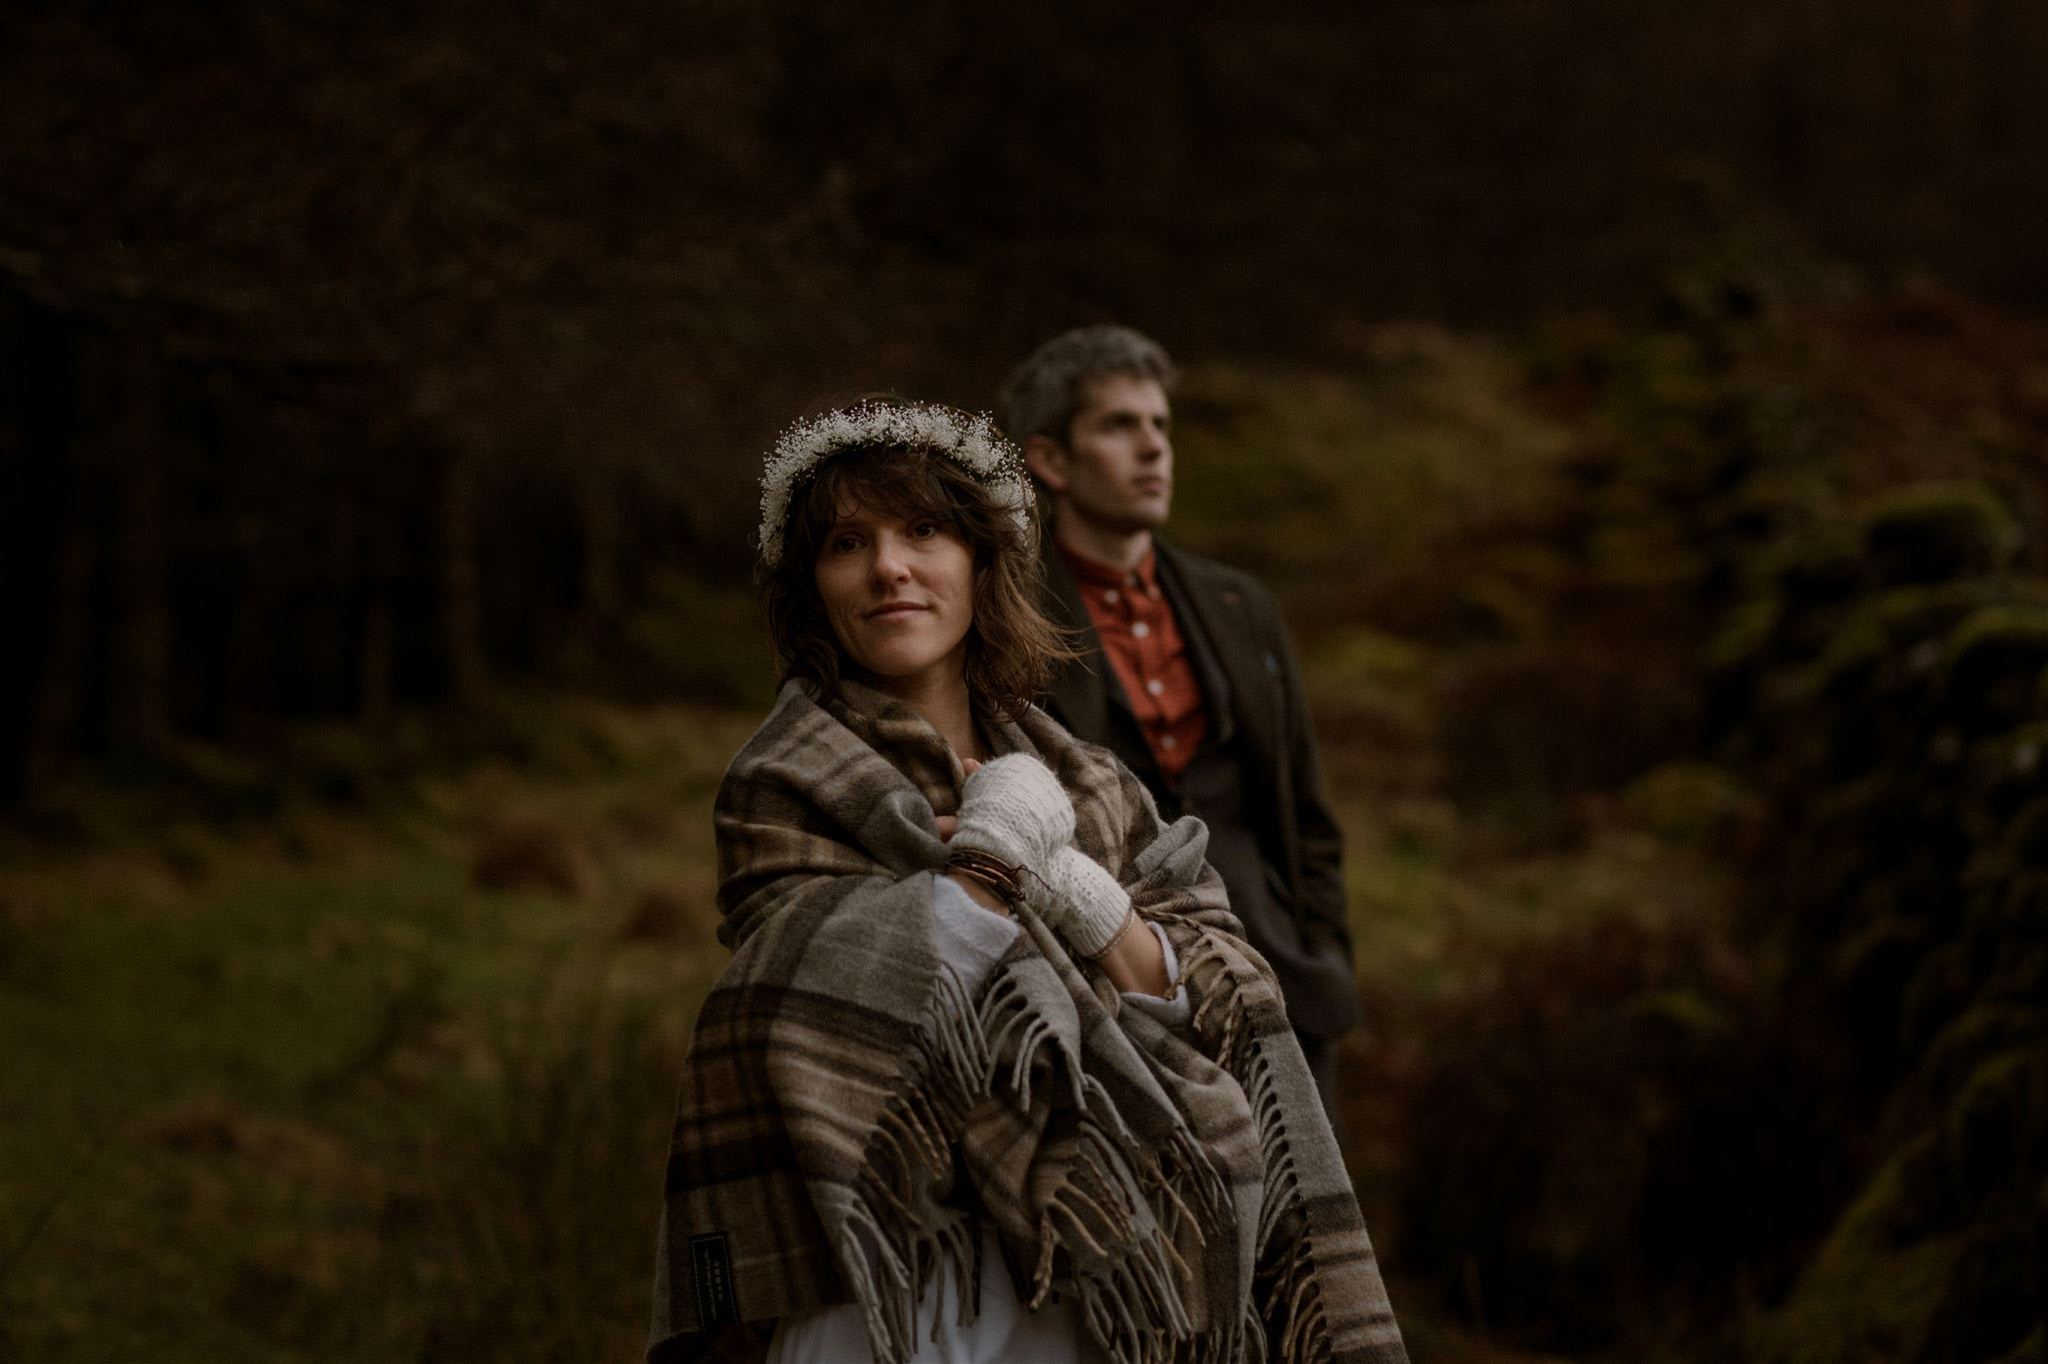 Scotland elopement wedding couple ready for their Scottish elopement wedding in walking boots and tartan blanket